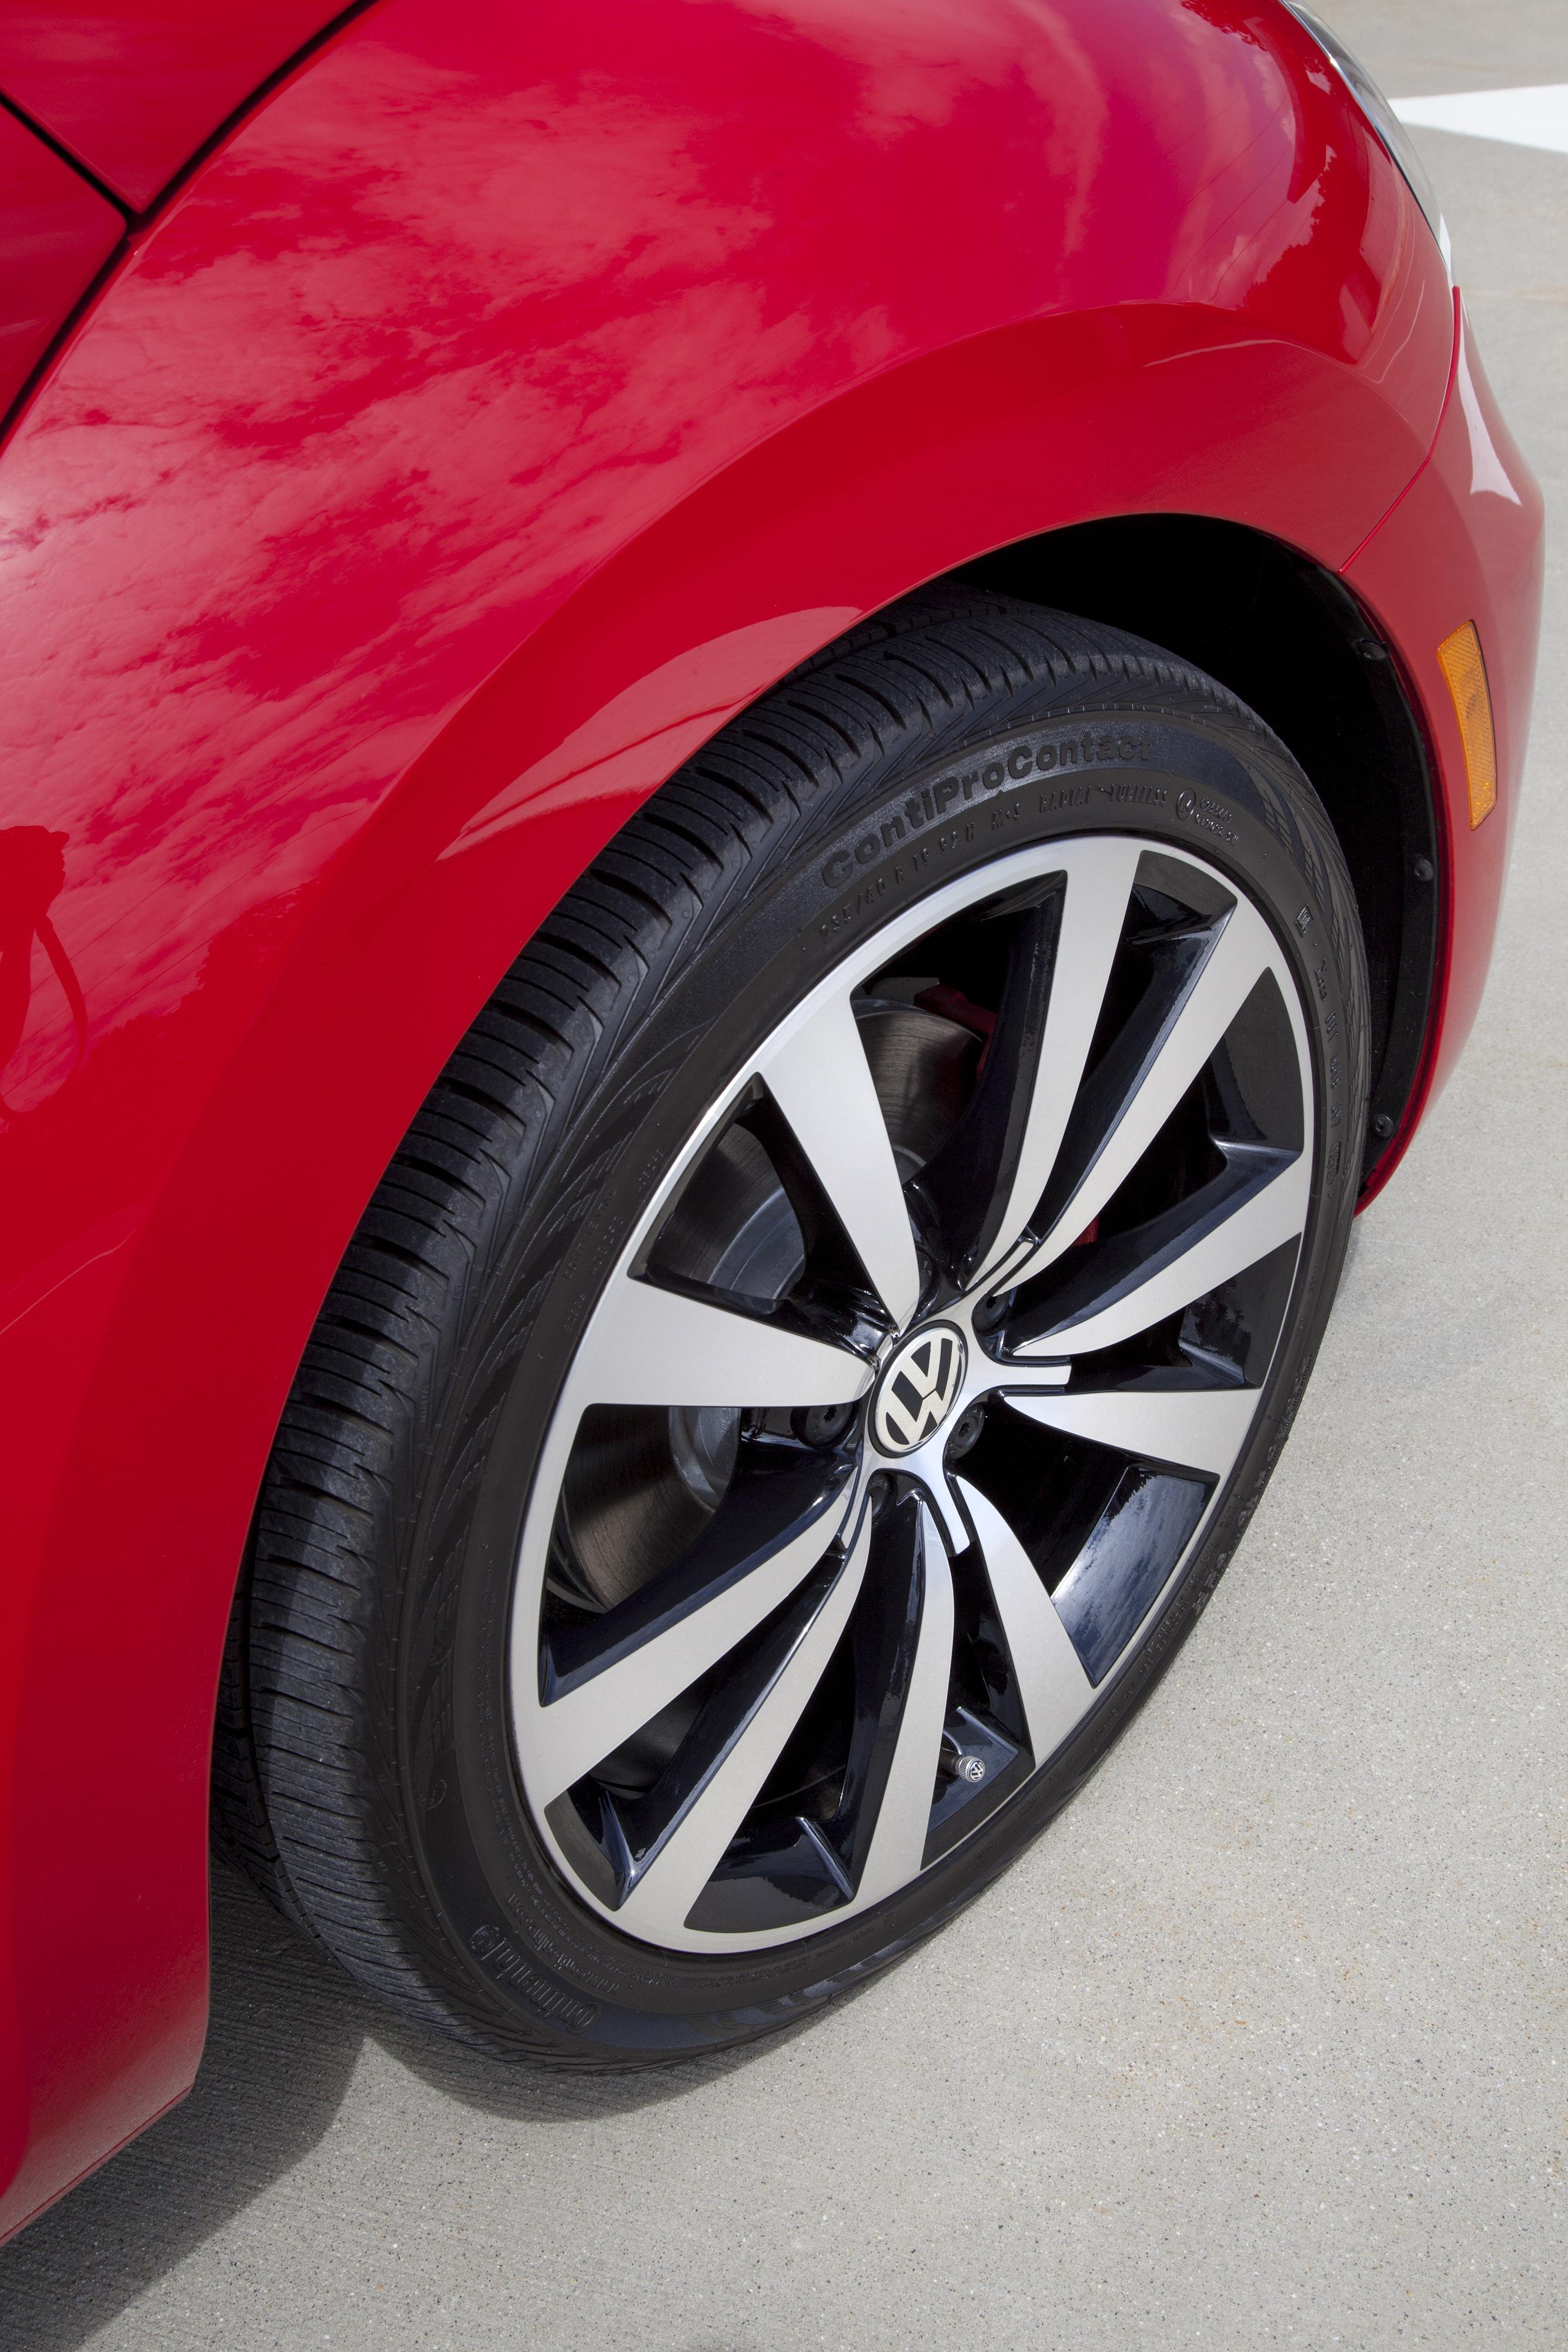 Steve White Vw >> Volkswagen Beetle 19 tornado wheel - c6h - silver w/ black ...